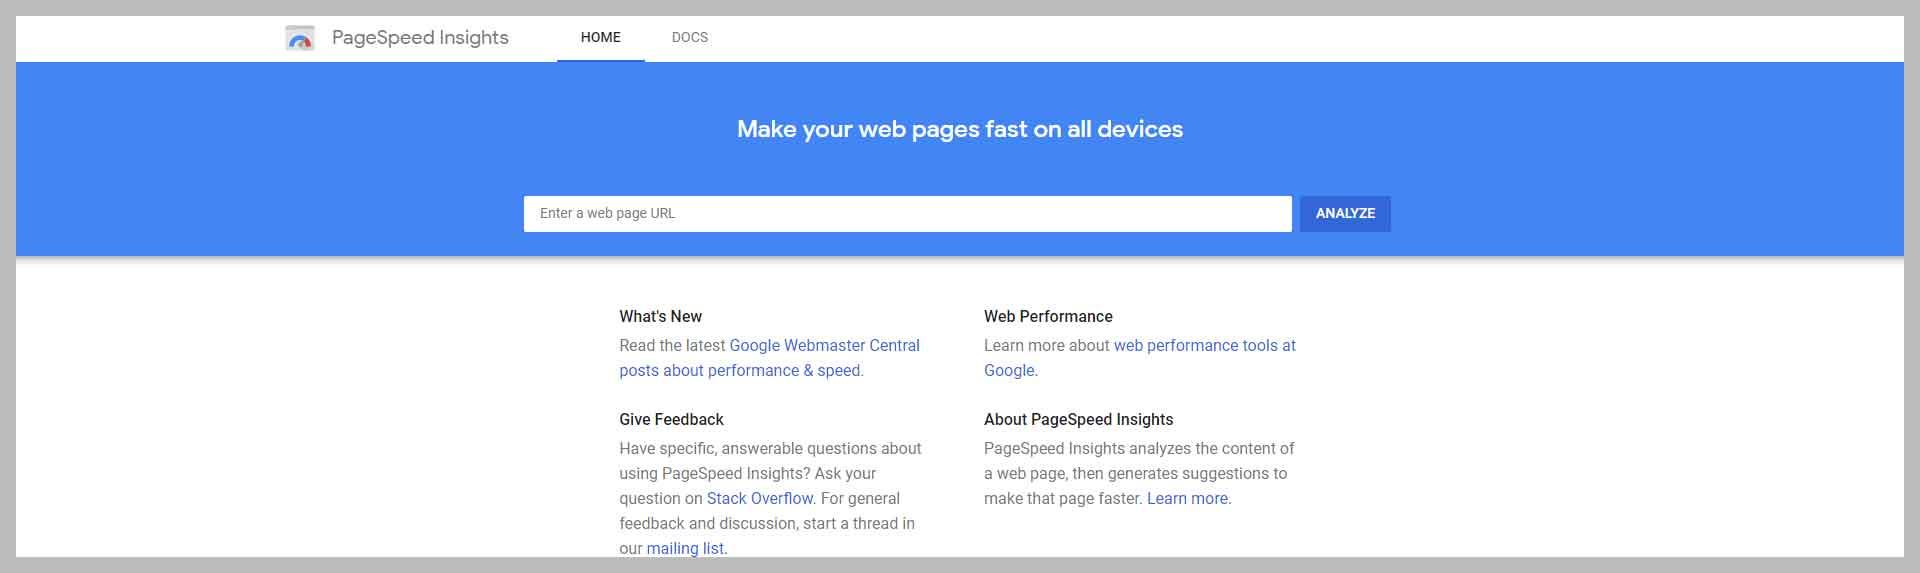 Google Page Speed Insights Screenshot